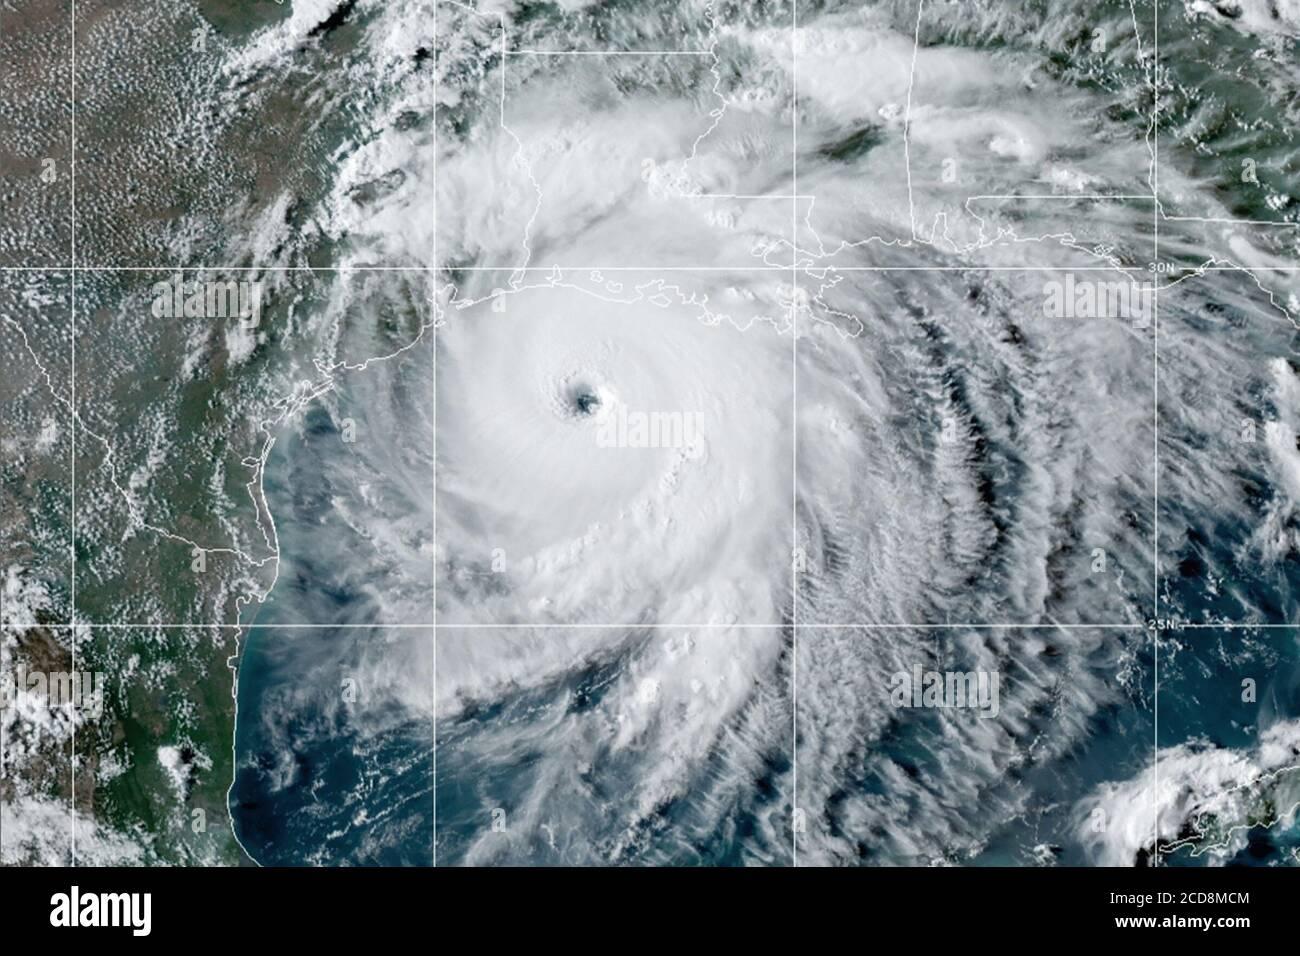 Hurricane Laura in the Gulf of Mexico approaching Cameron, Louisiana as a powerful category 4 hurricane. (USA) Stock Photo